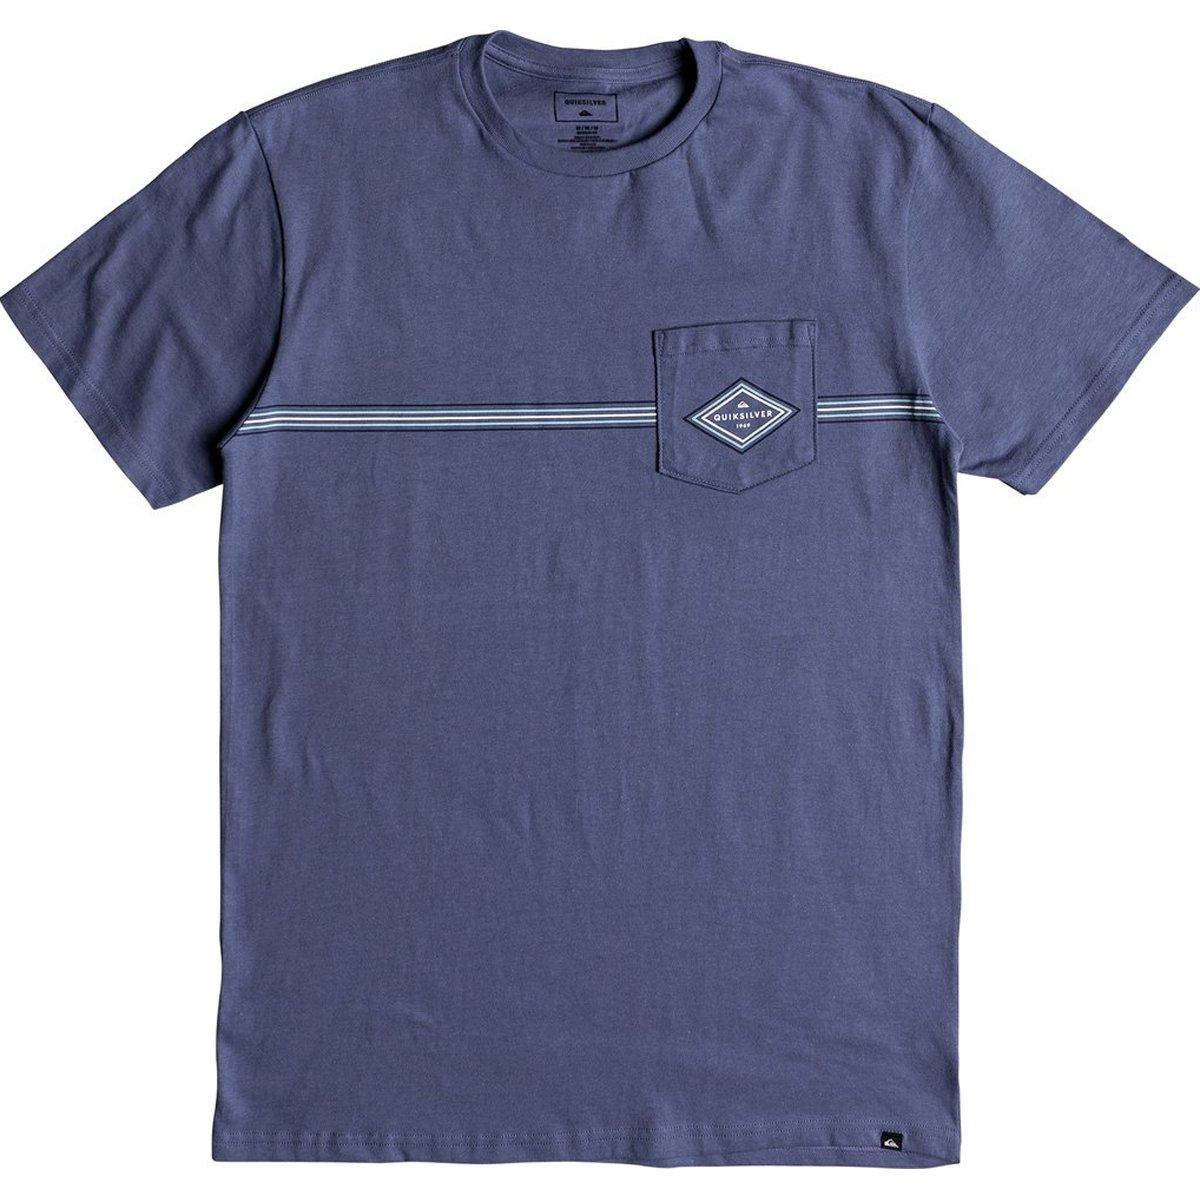 Quiksilver Men's Crosstown Tee Shirt, Bijou Blue, XL